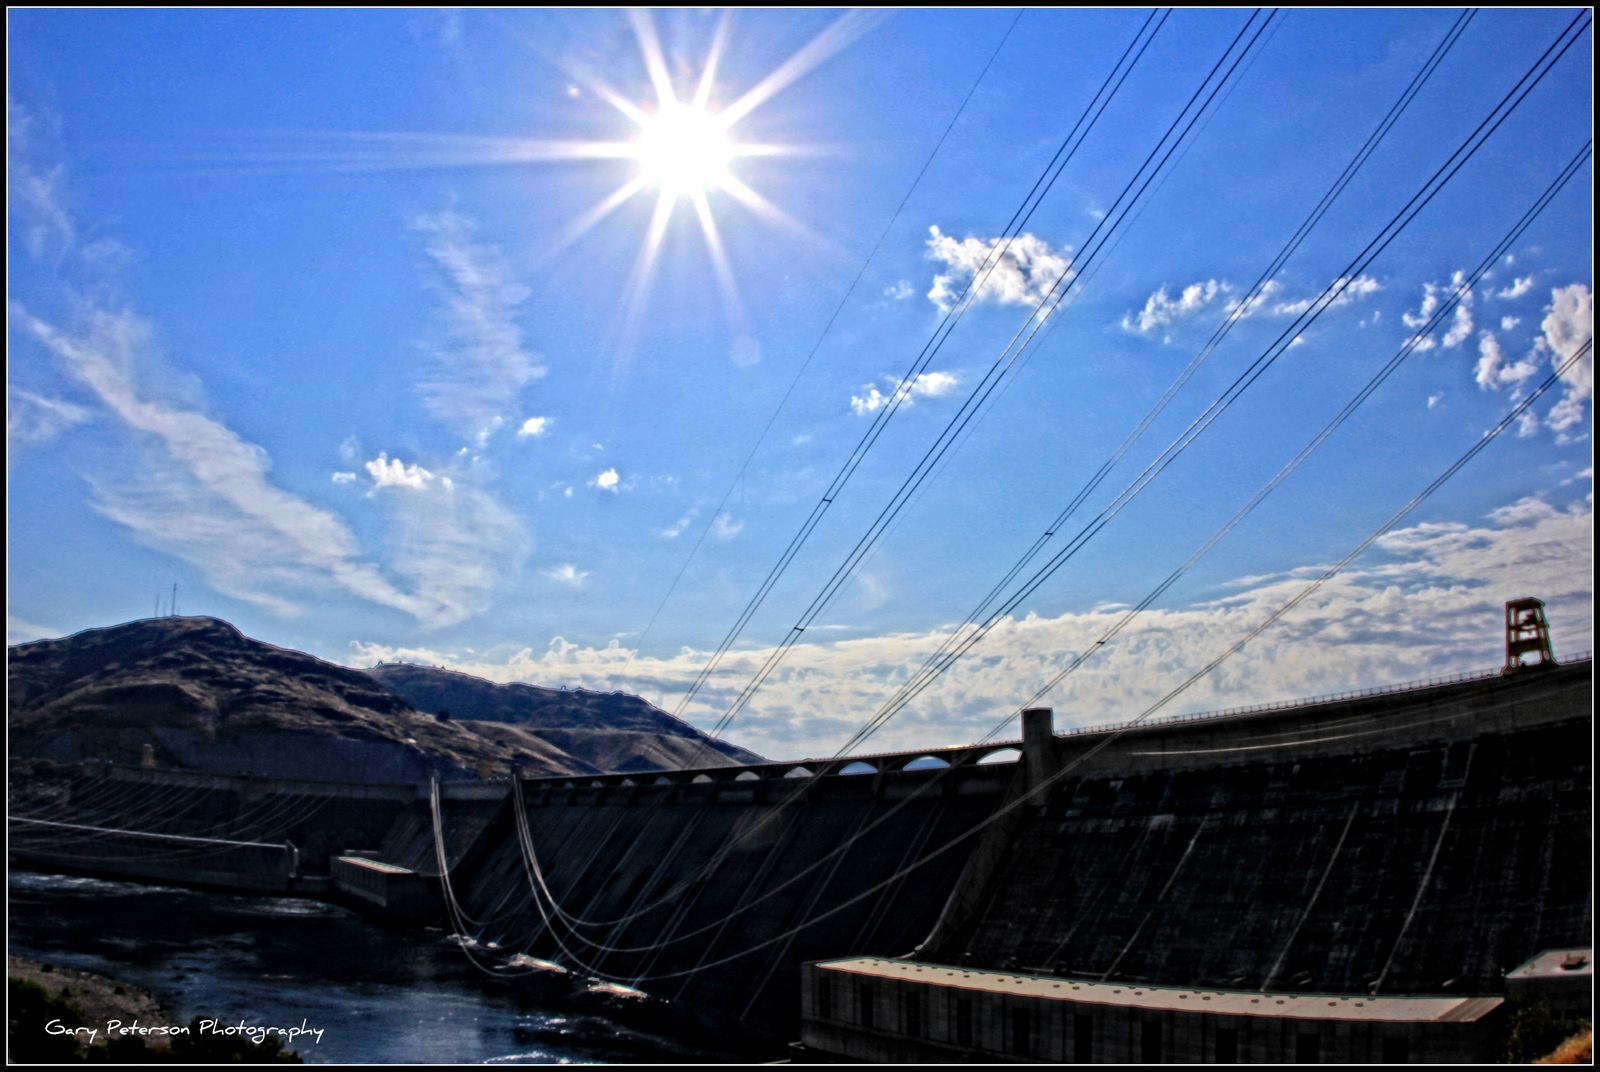 047-1-coulee dam .jpg